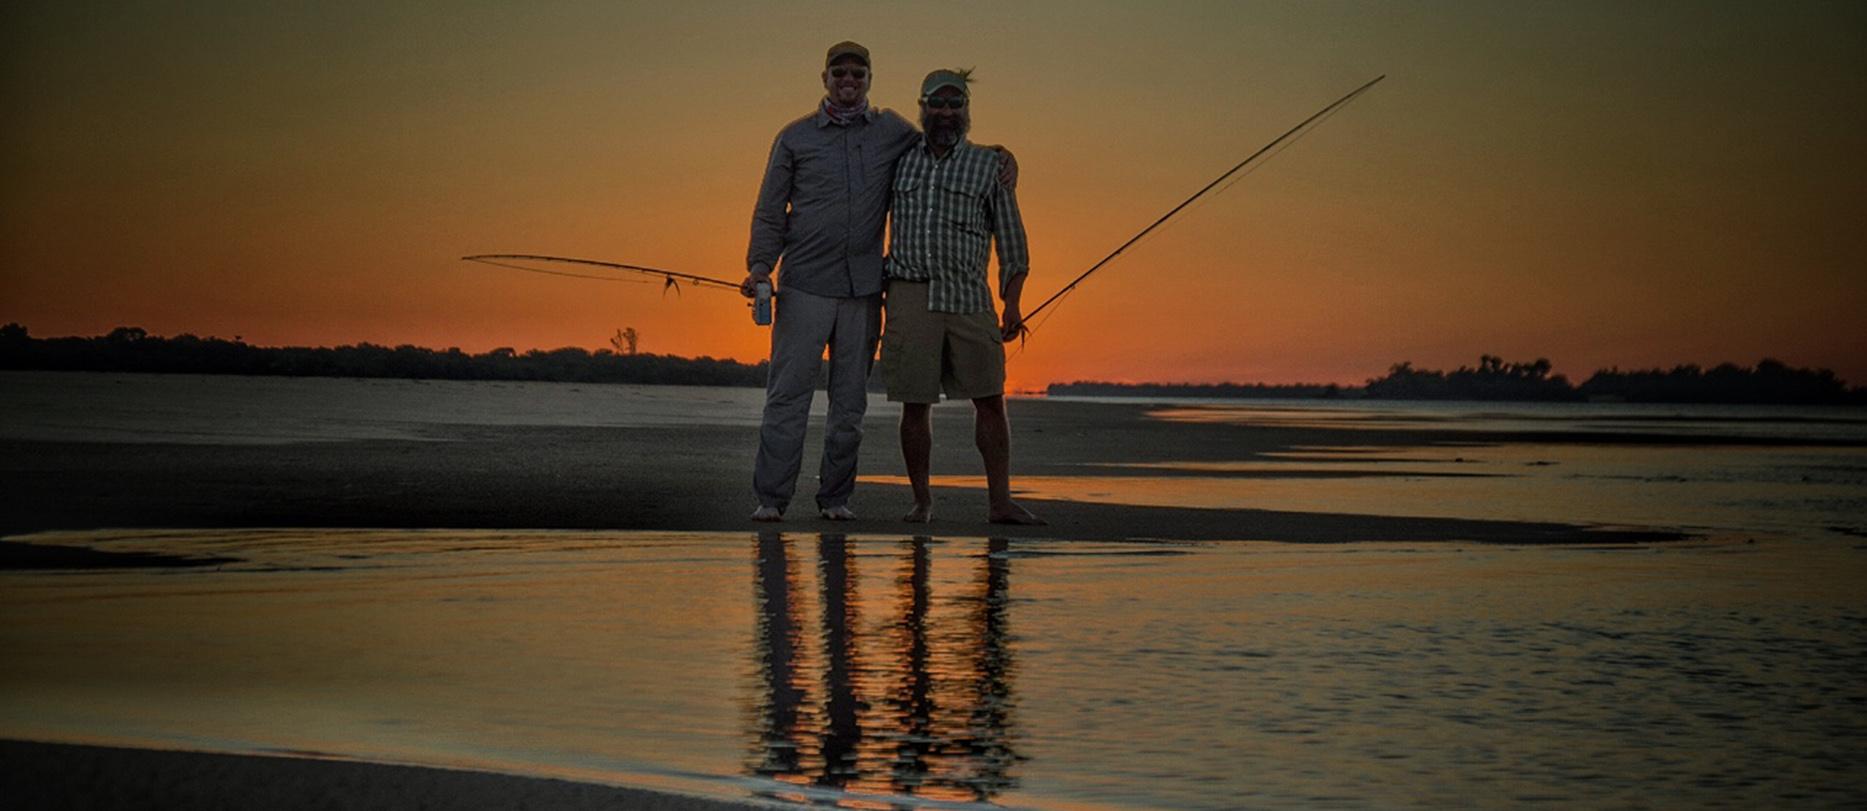 Travel Fly Fishing Travel Agent Bonefish Lodge World